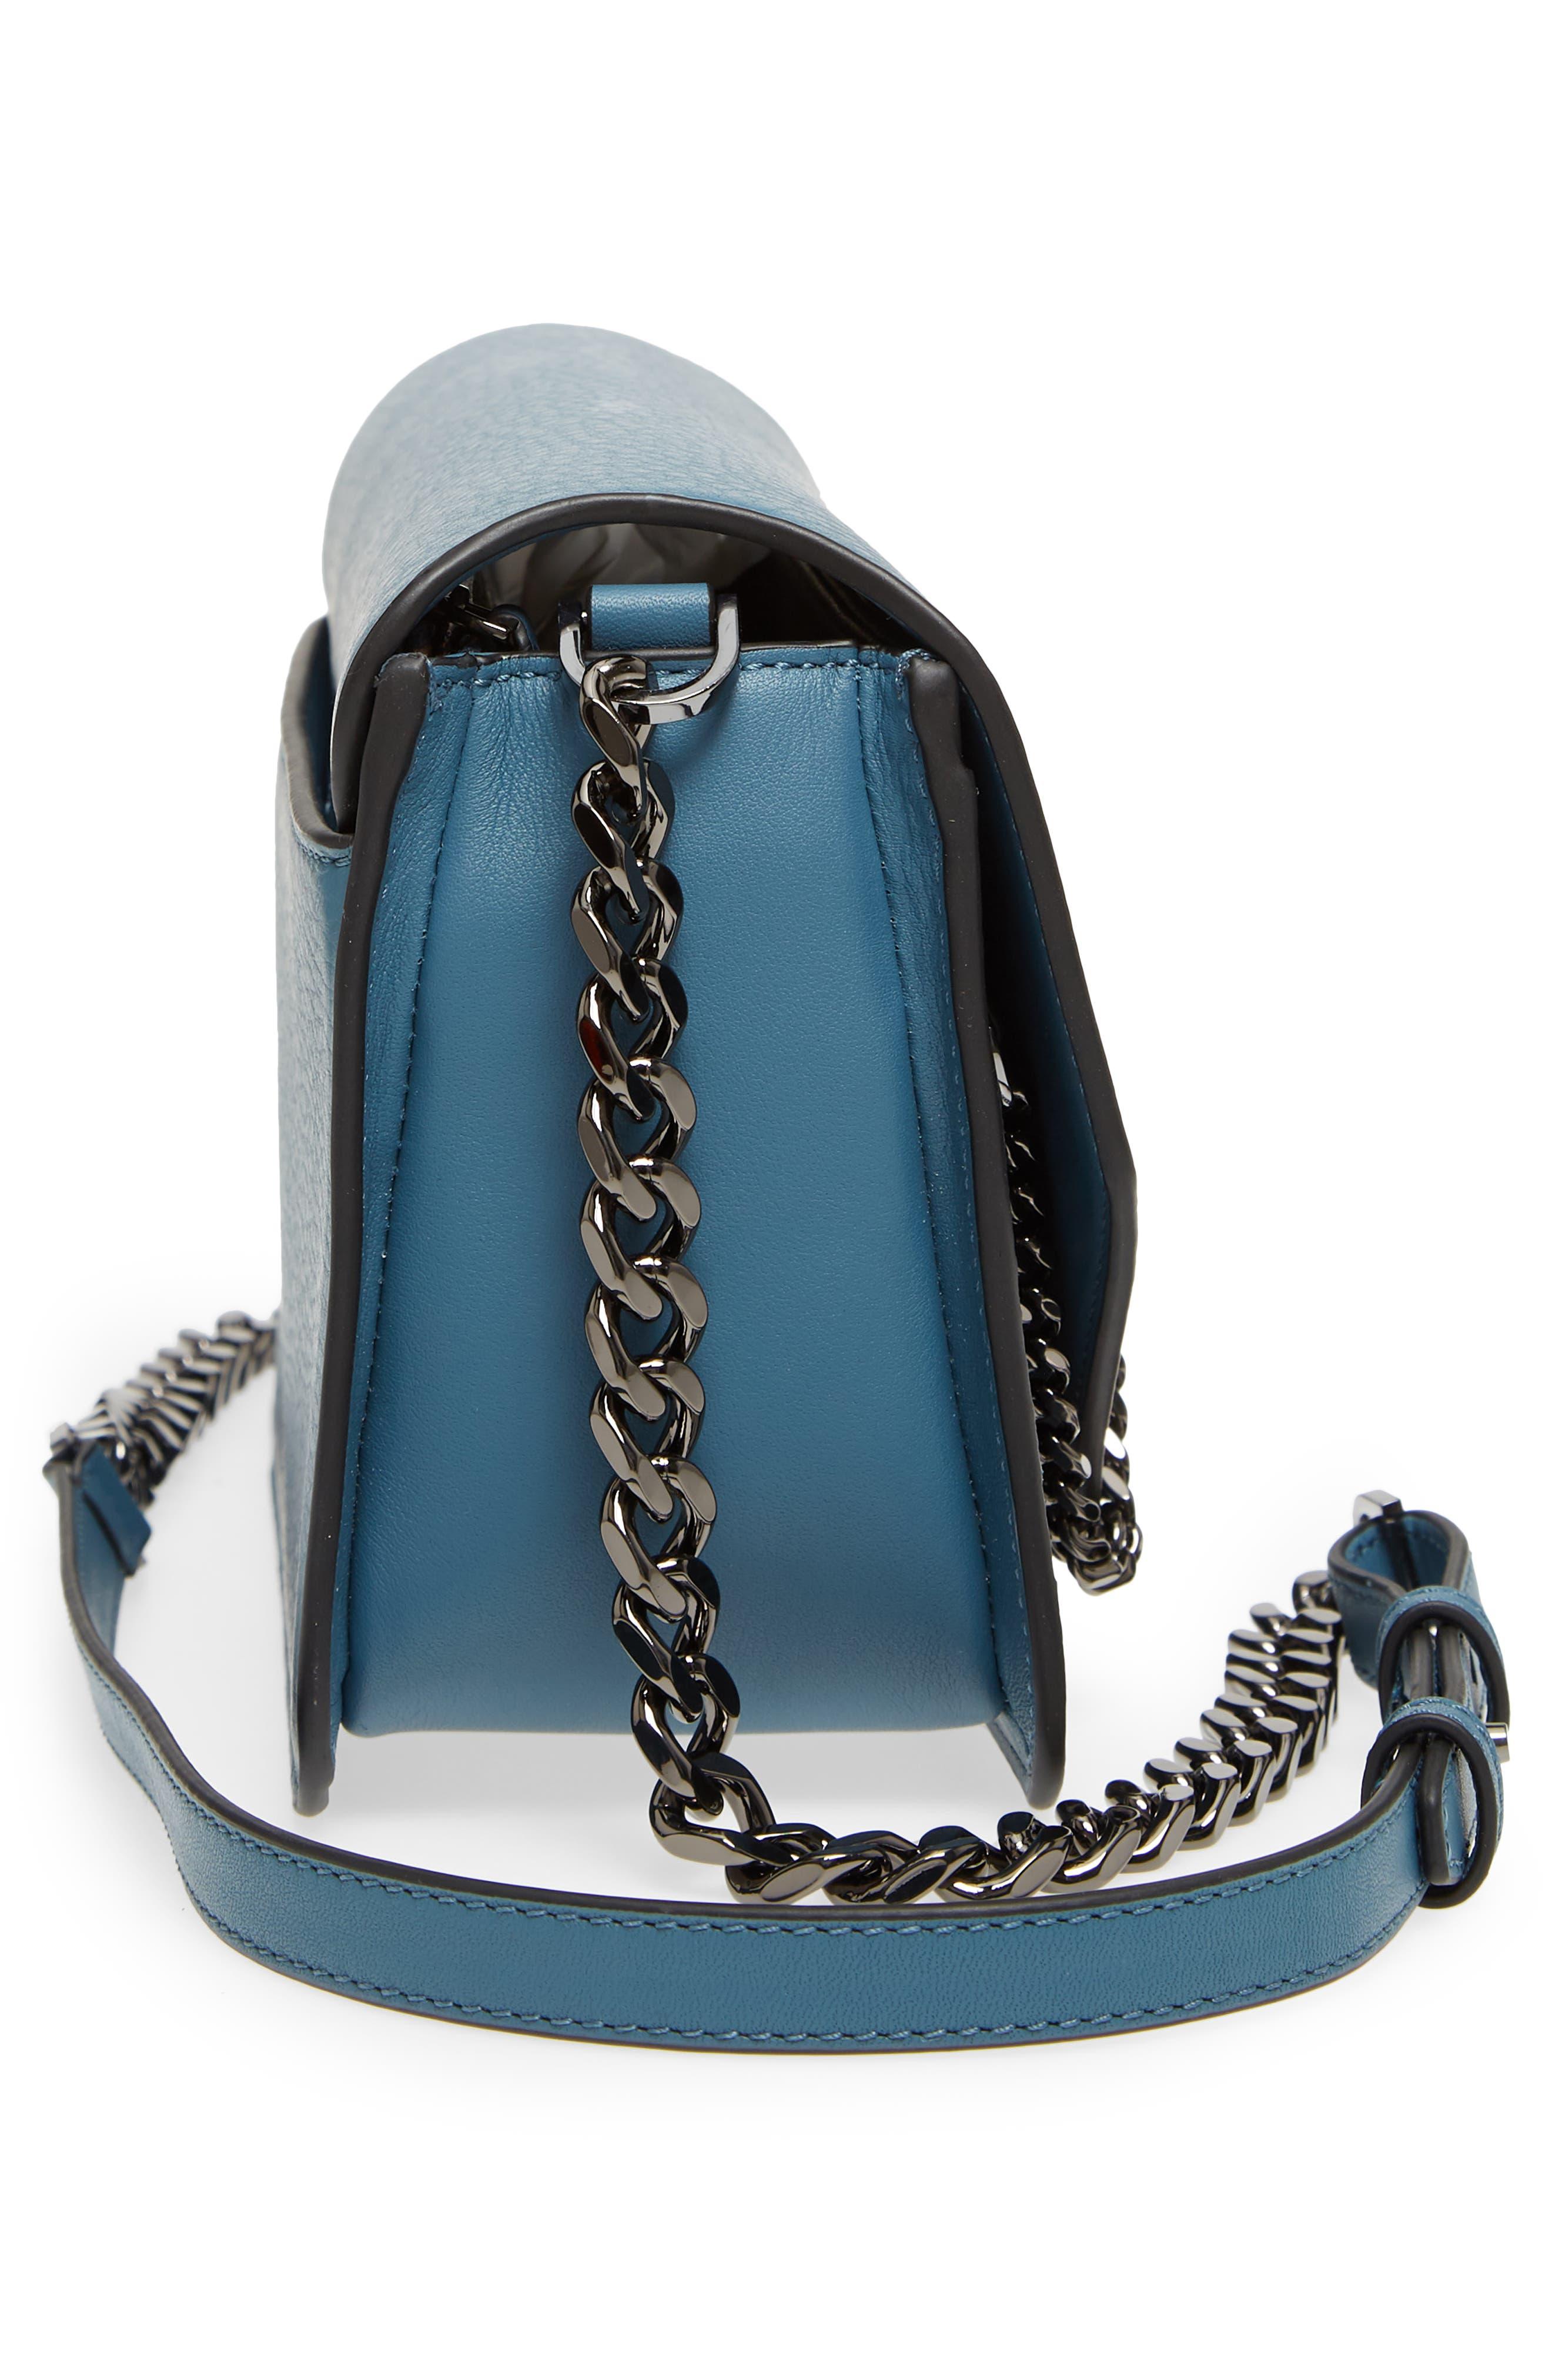 Cortney Nappa Leather Shoulder/Crossbody Bag,                             Alternate thumbnail 19, color,